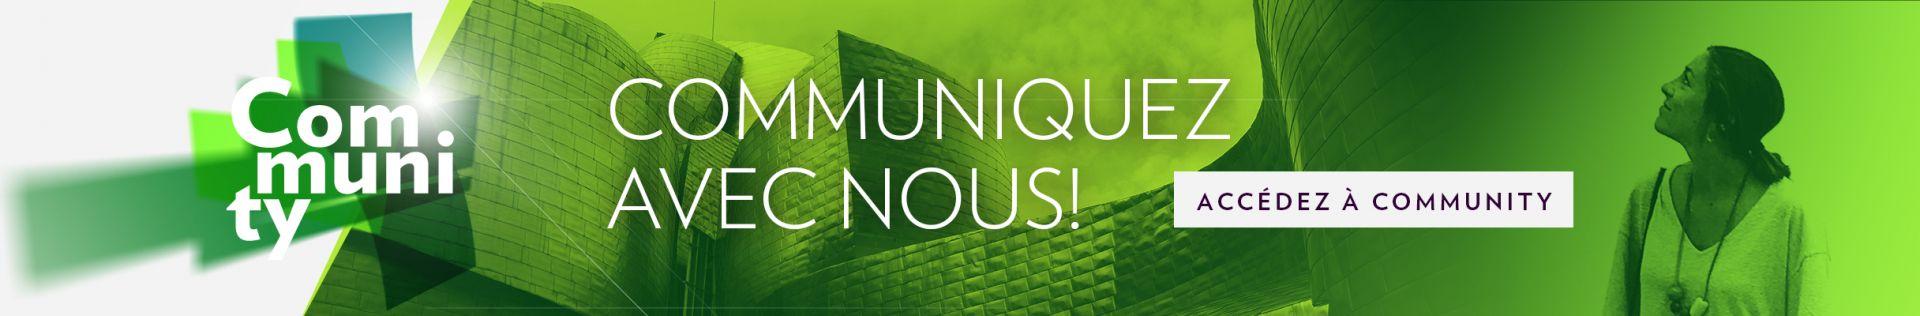 community verde FR 2432x400